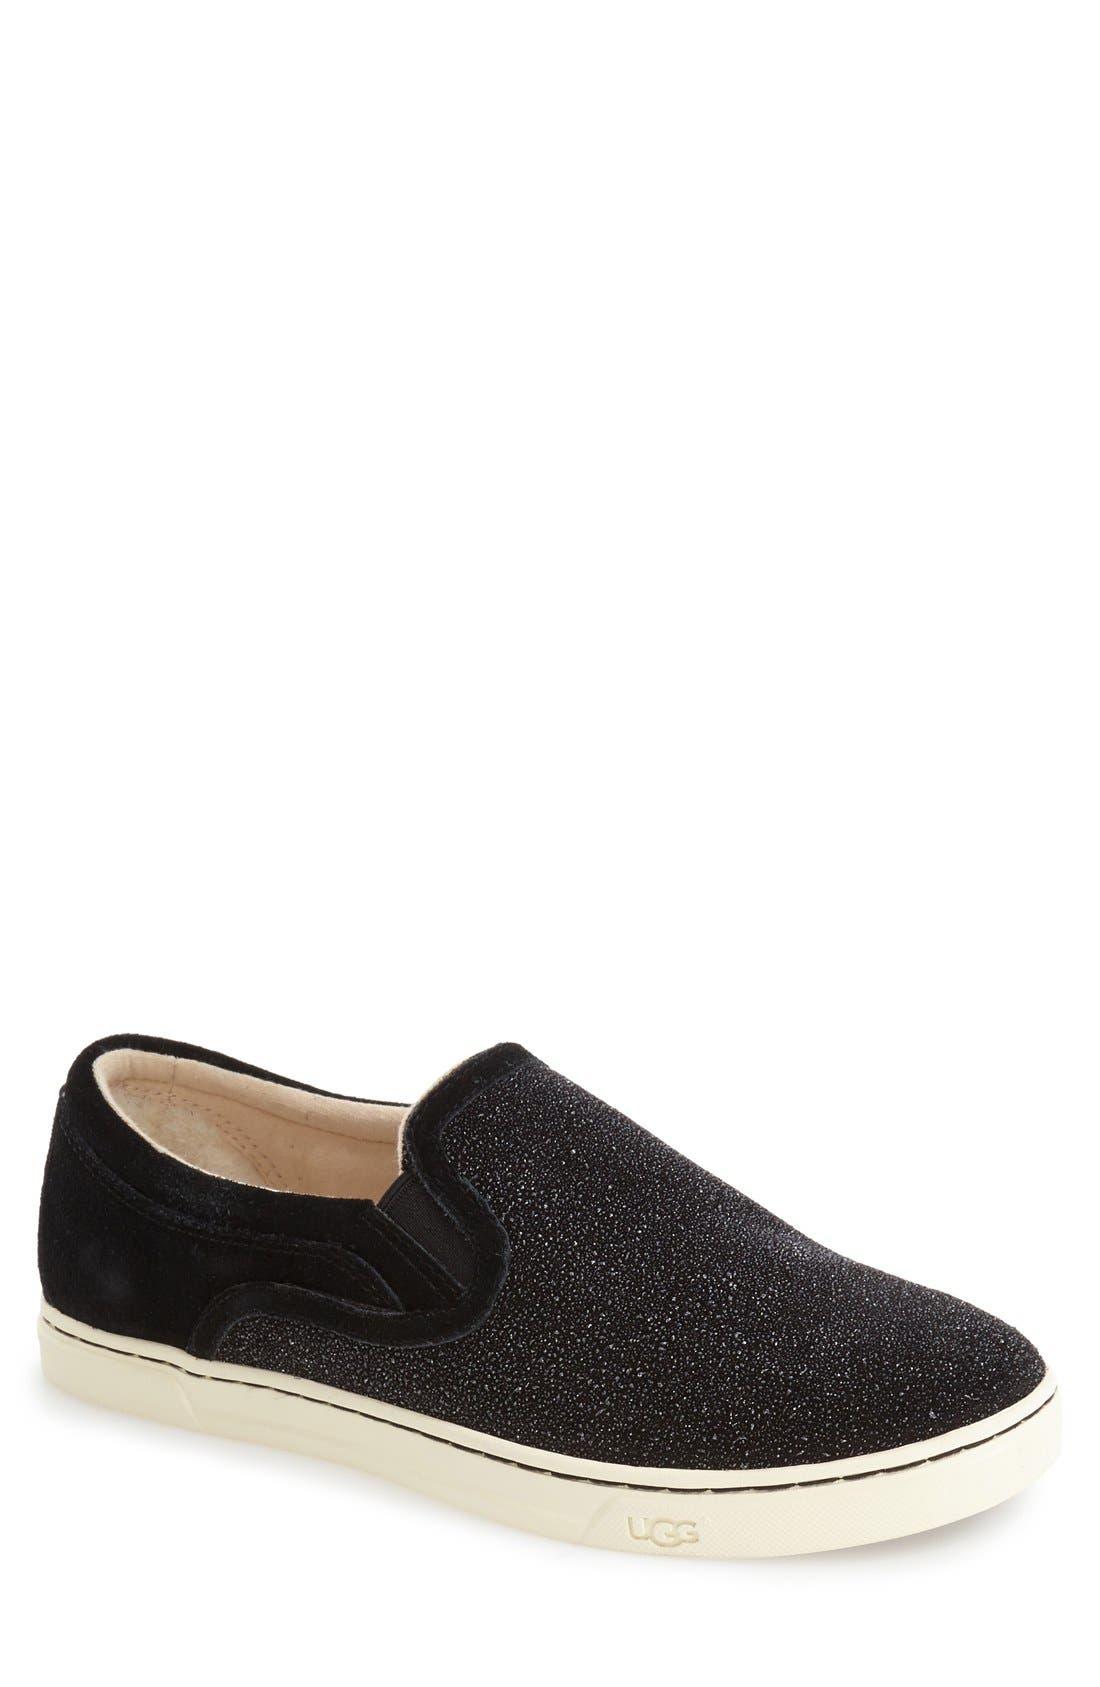 Fierce Slip-On Sneaker,                         Main,                         color, Black Fabric